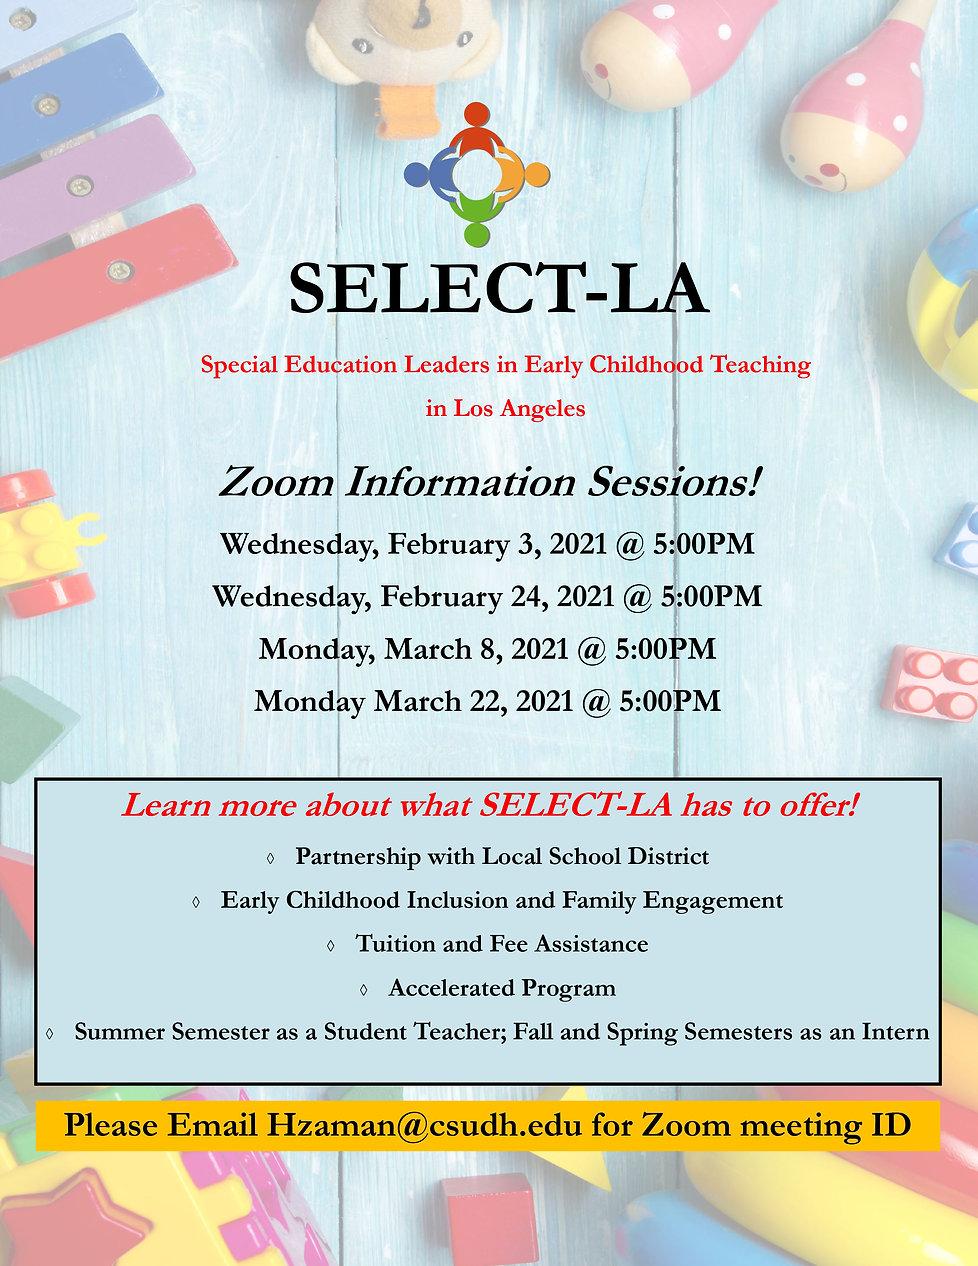 SELECT-LA Zoom Information Sessions (FEB